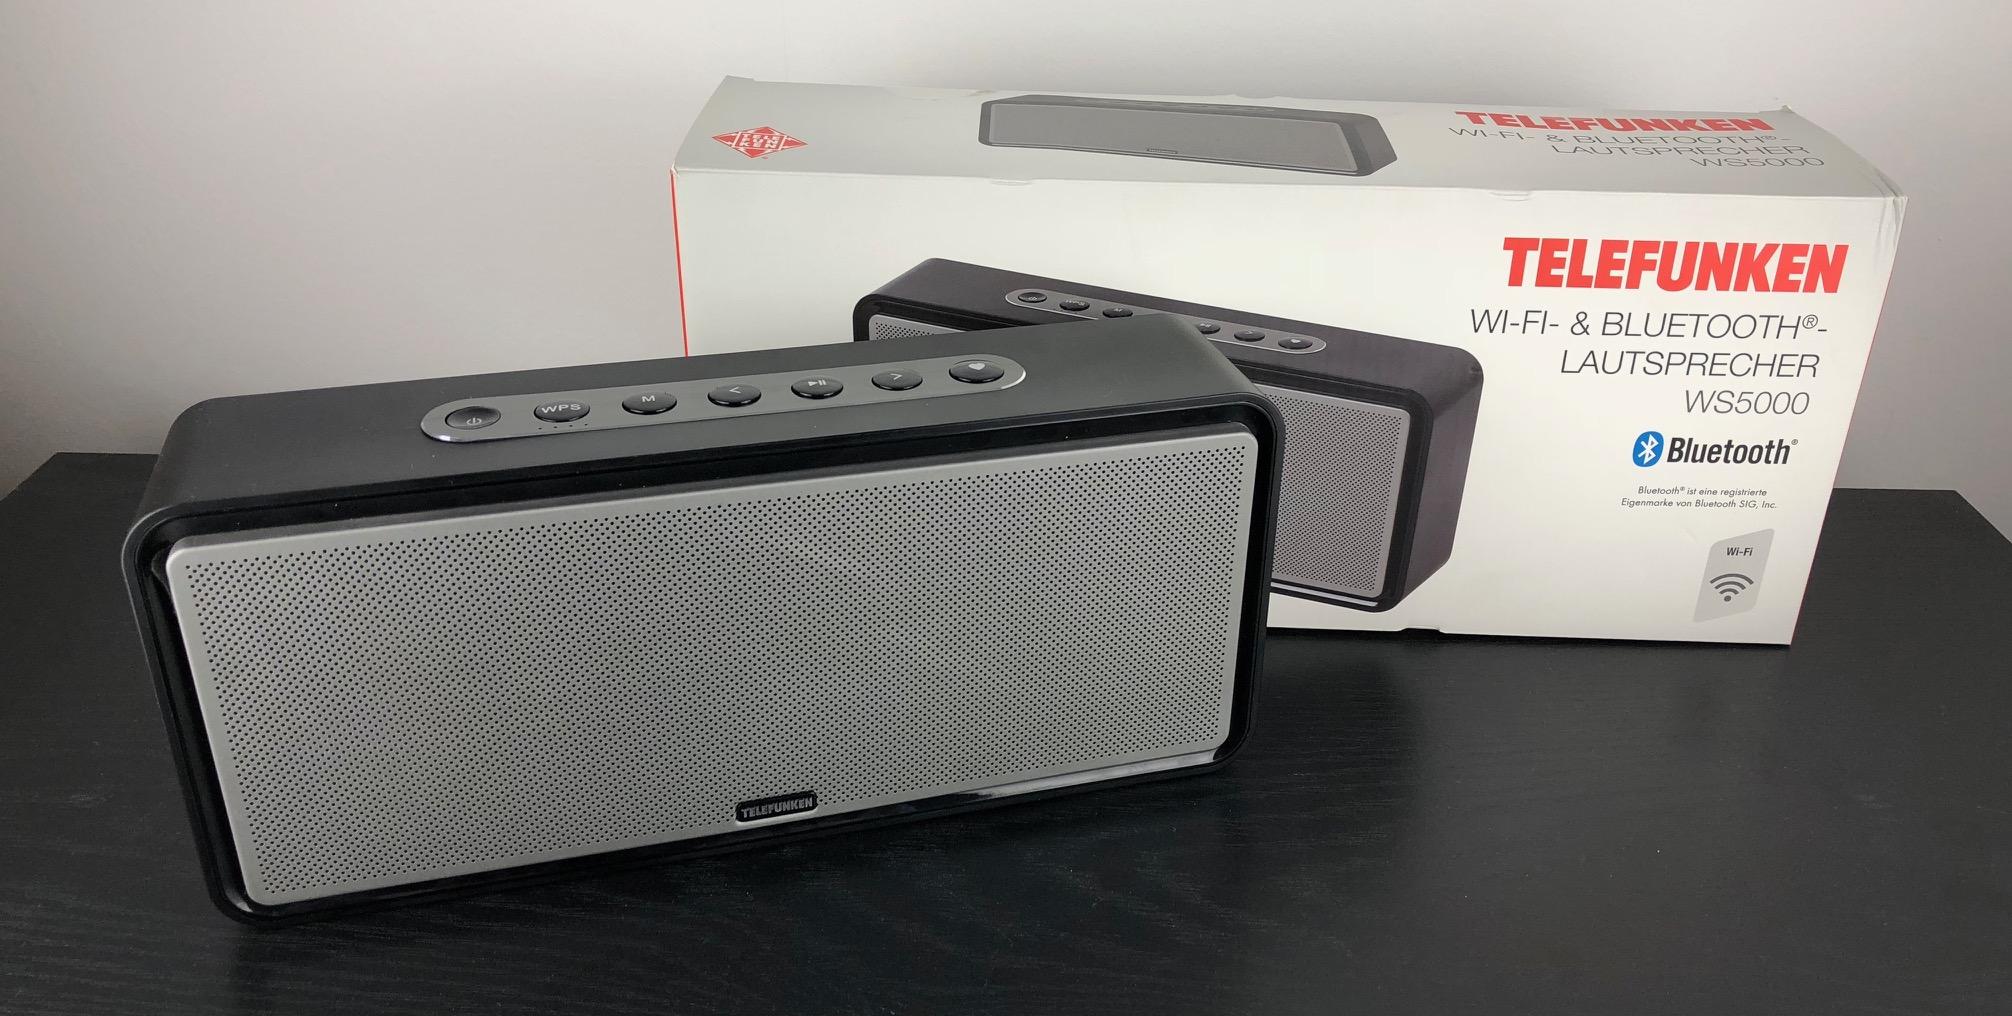 Telefunken WS5000 Test